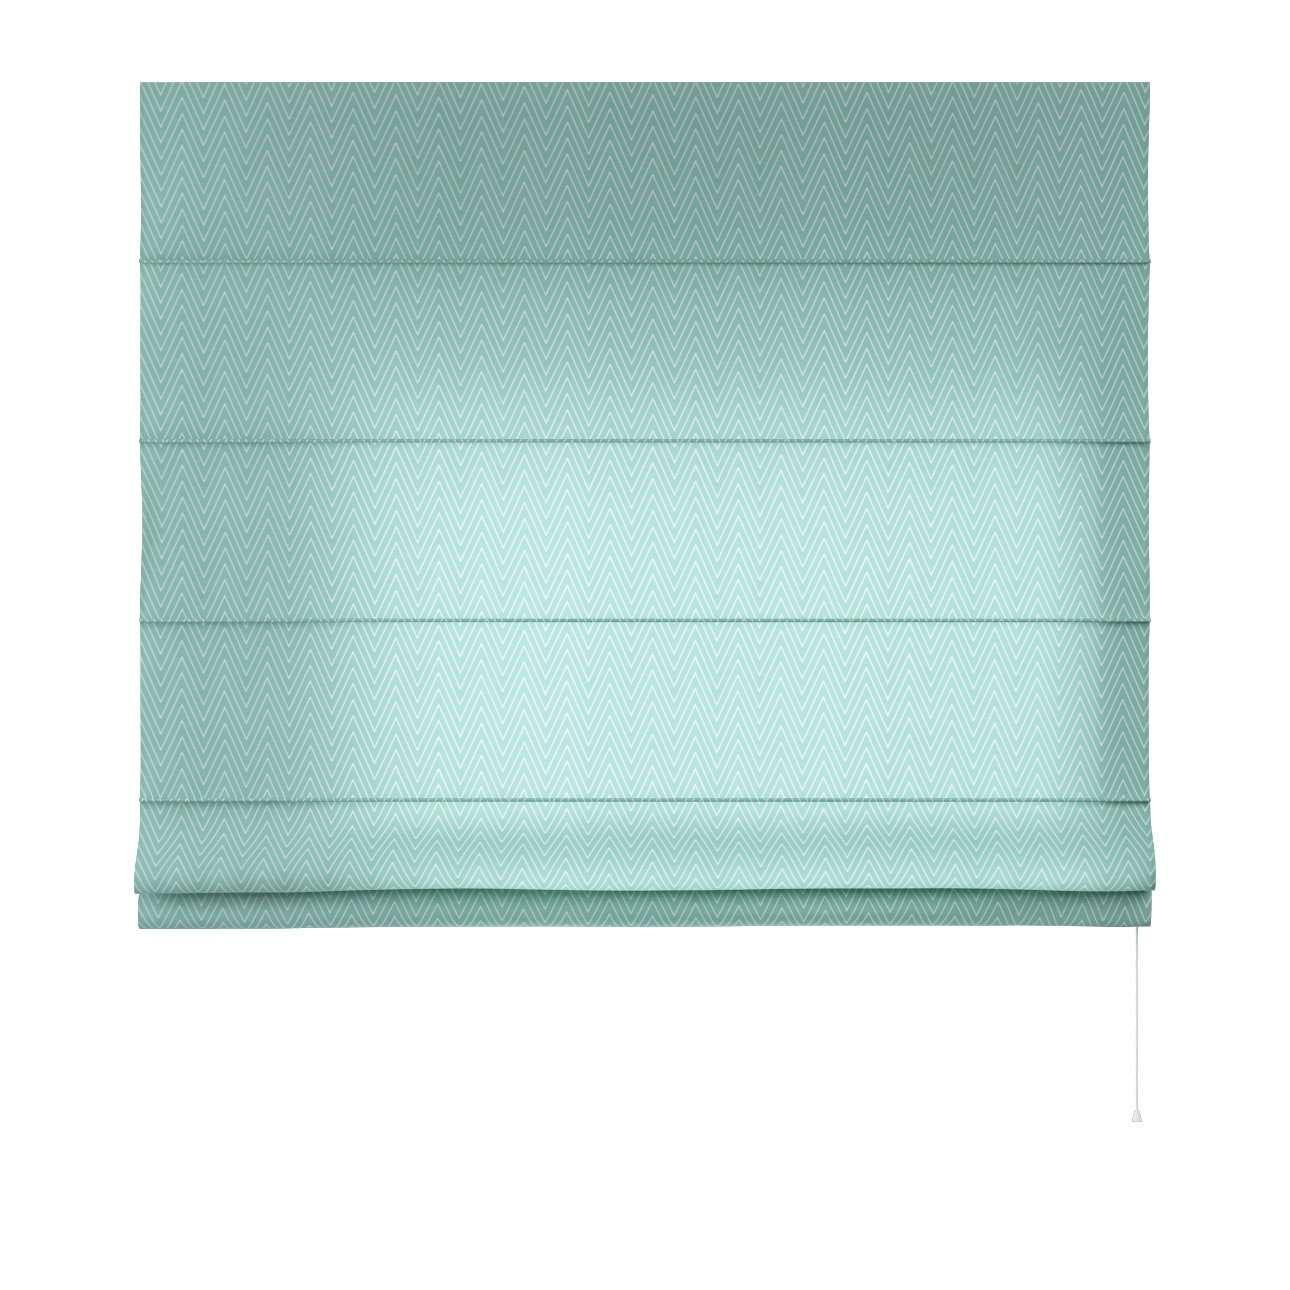 Raffrollo Capri 80 x 170 cm von der Kollektion Brooklyn, Stoff: 137-90